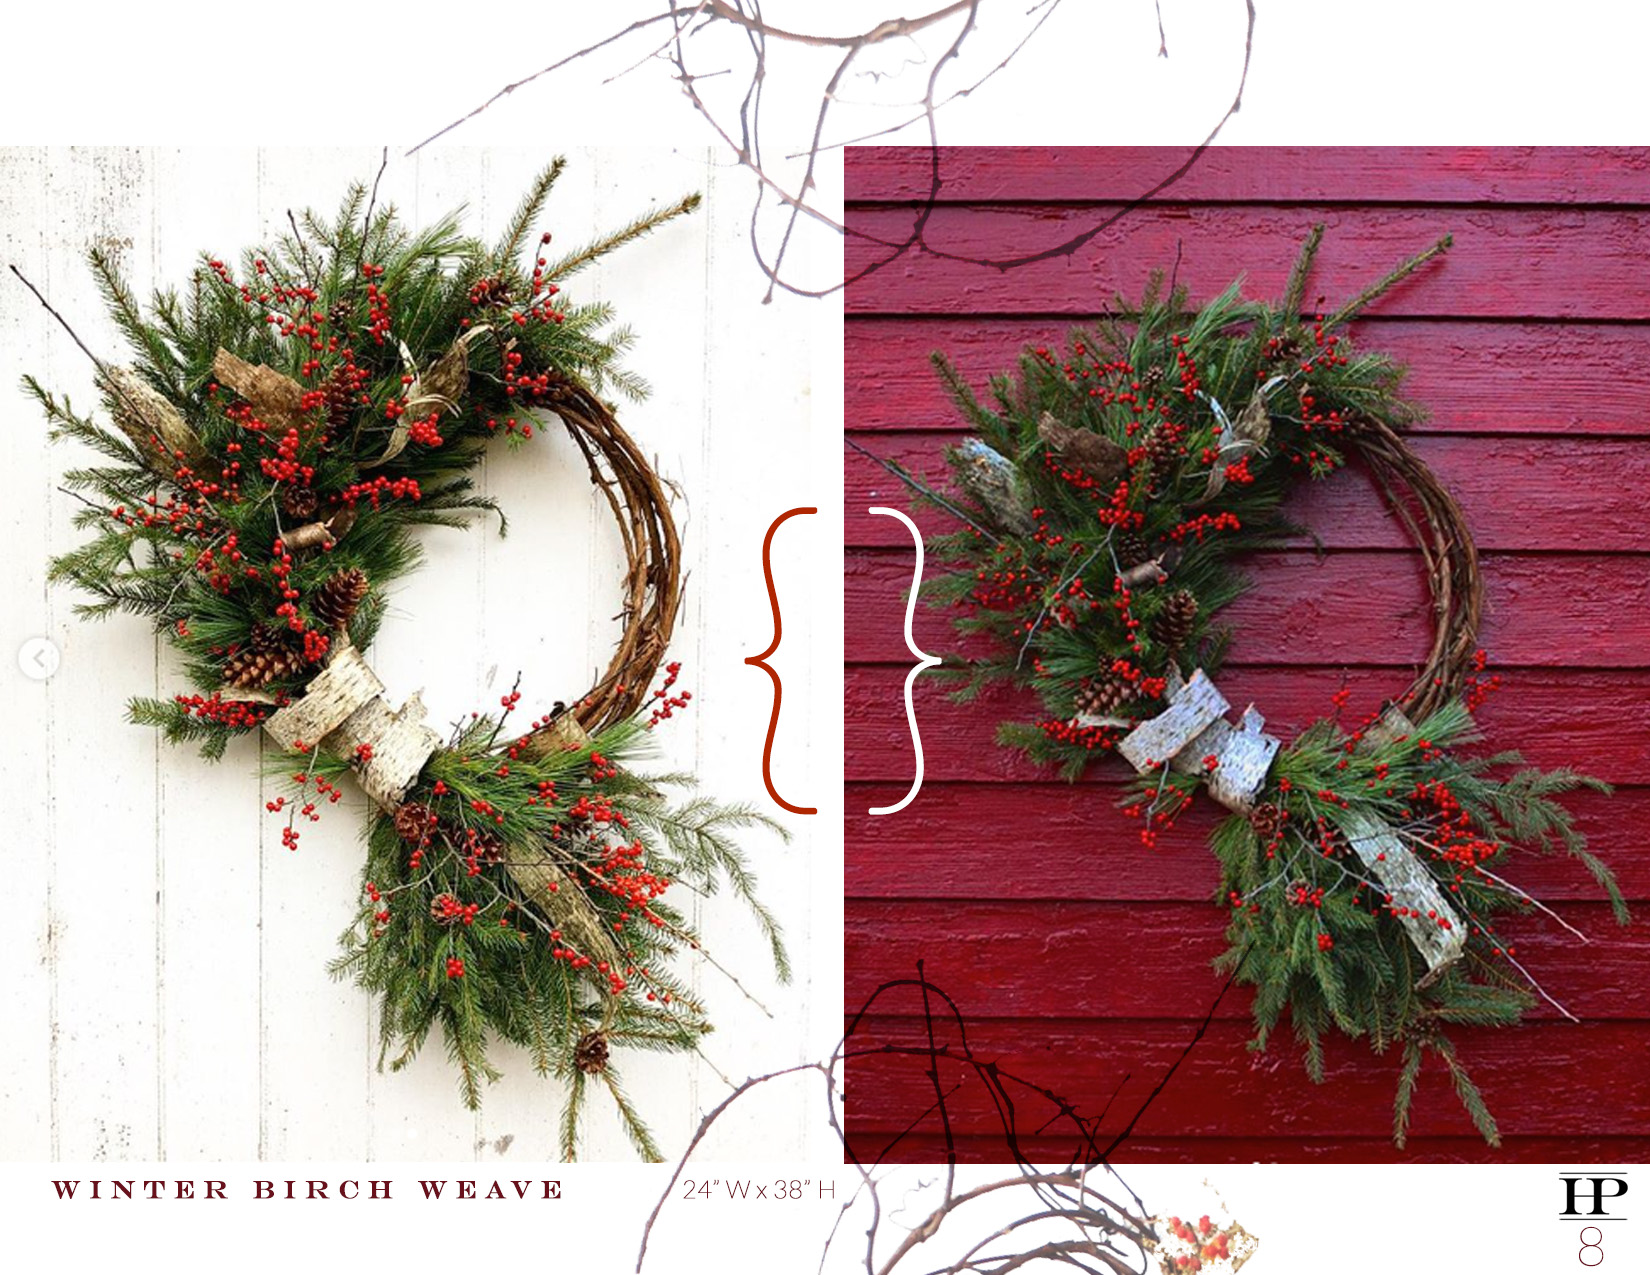 Page 7|8 - WinterBirchWeave_Wreath.jpg